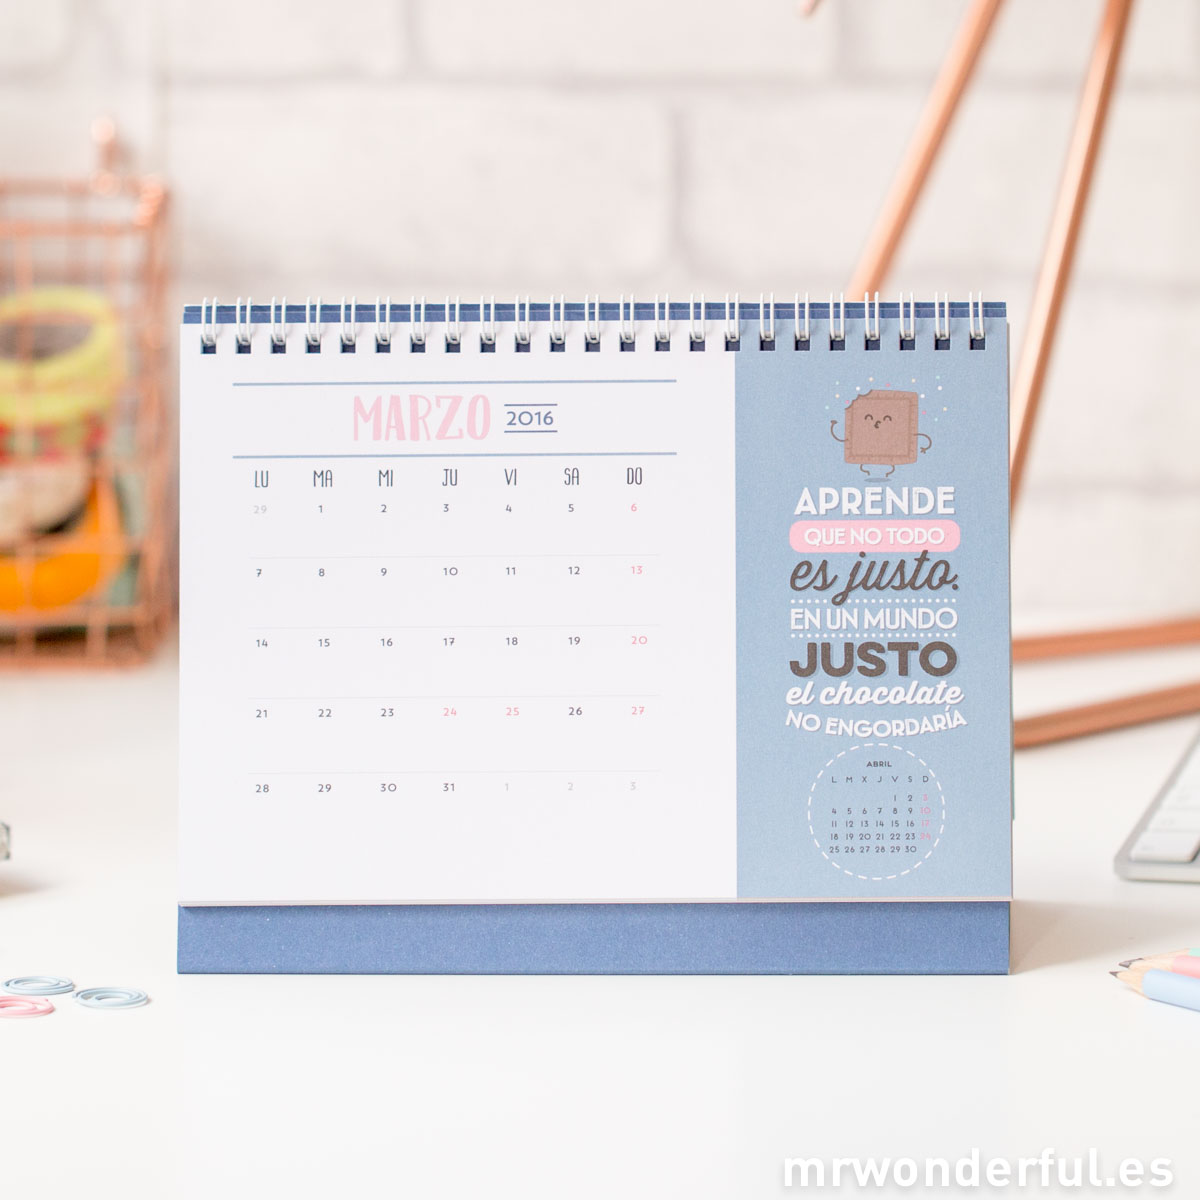 mrwonderful_WOA02926_8436547193615_Calendario-Trabajo-castellano-2015-2016-19